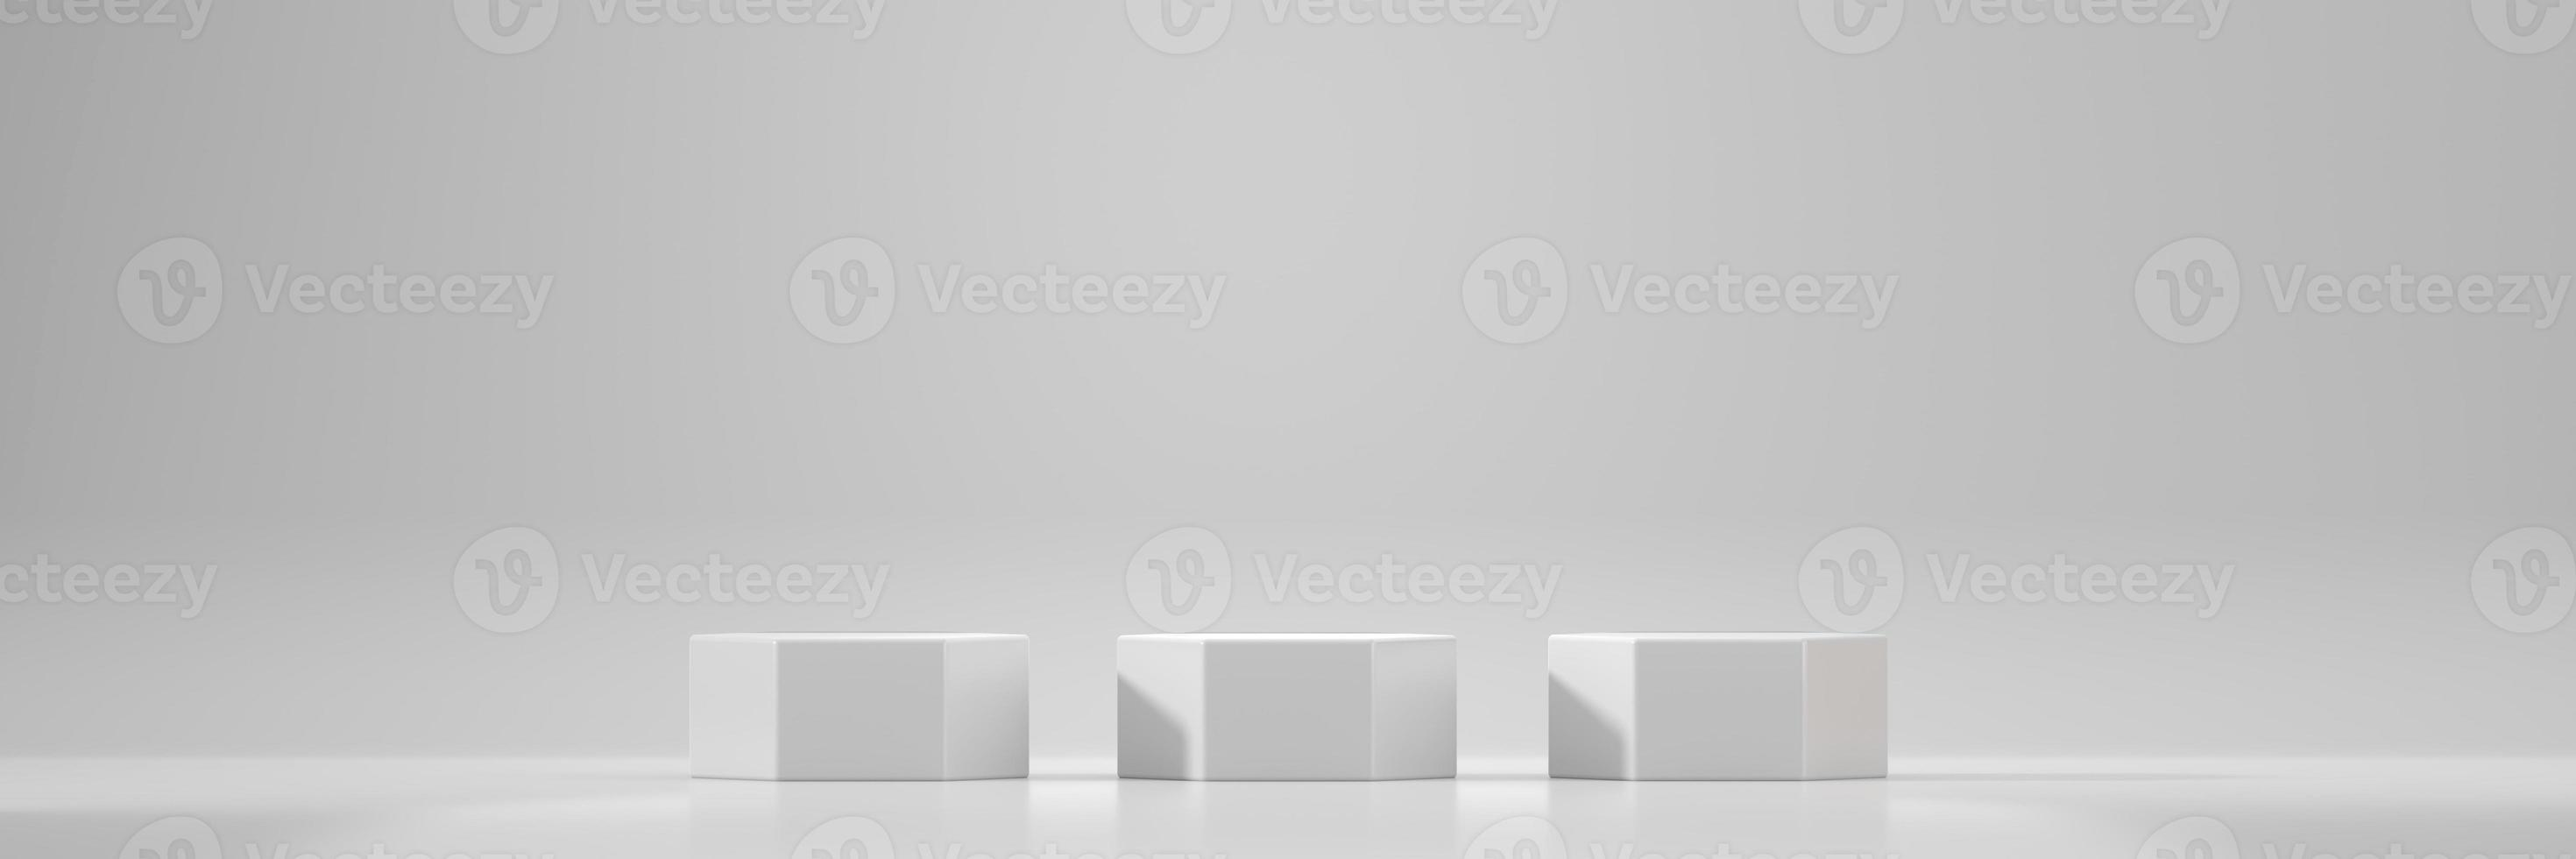 vit sexkant scen podium plattform mockup foto